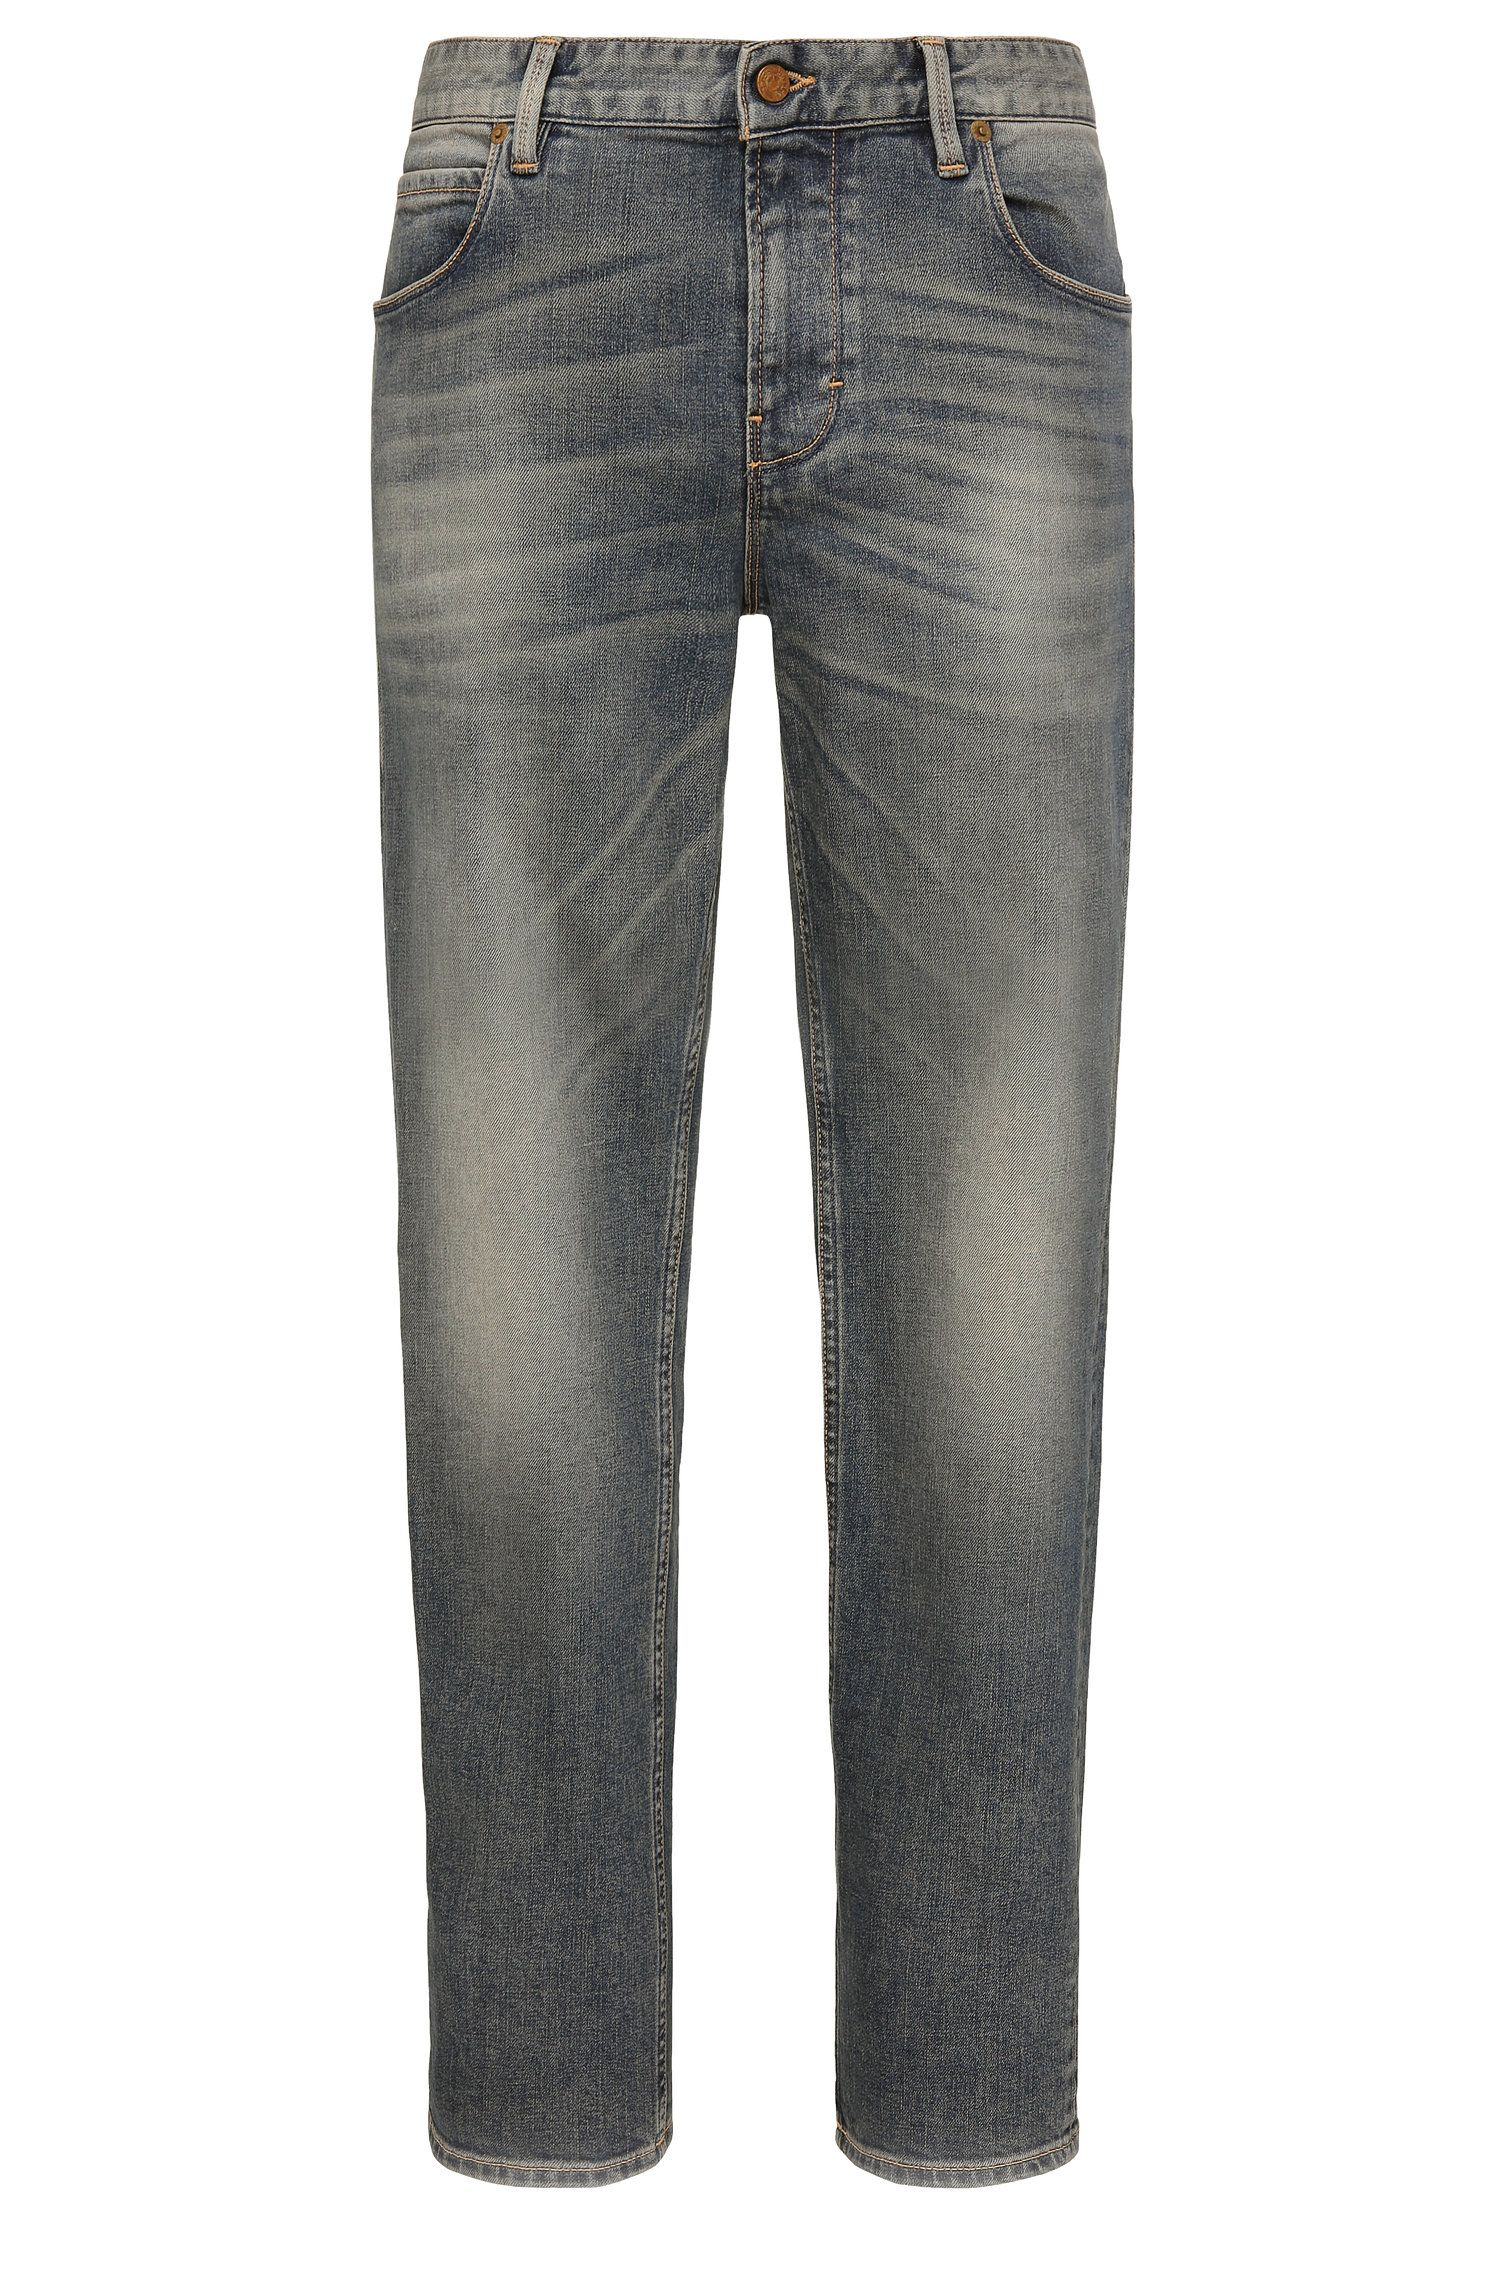 13 oz Stretch Cotton Jeans, Slim Fit | Orange63